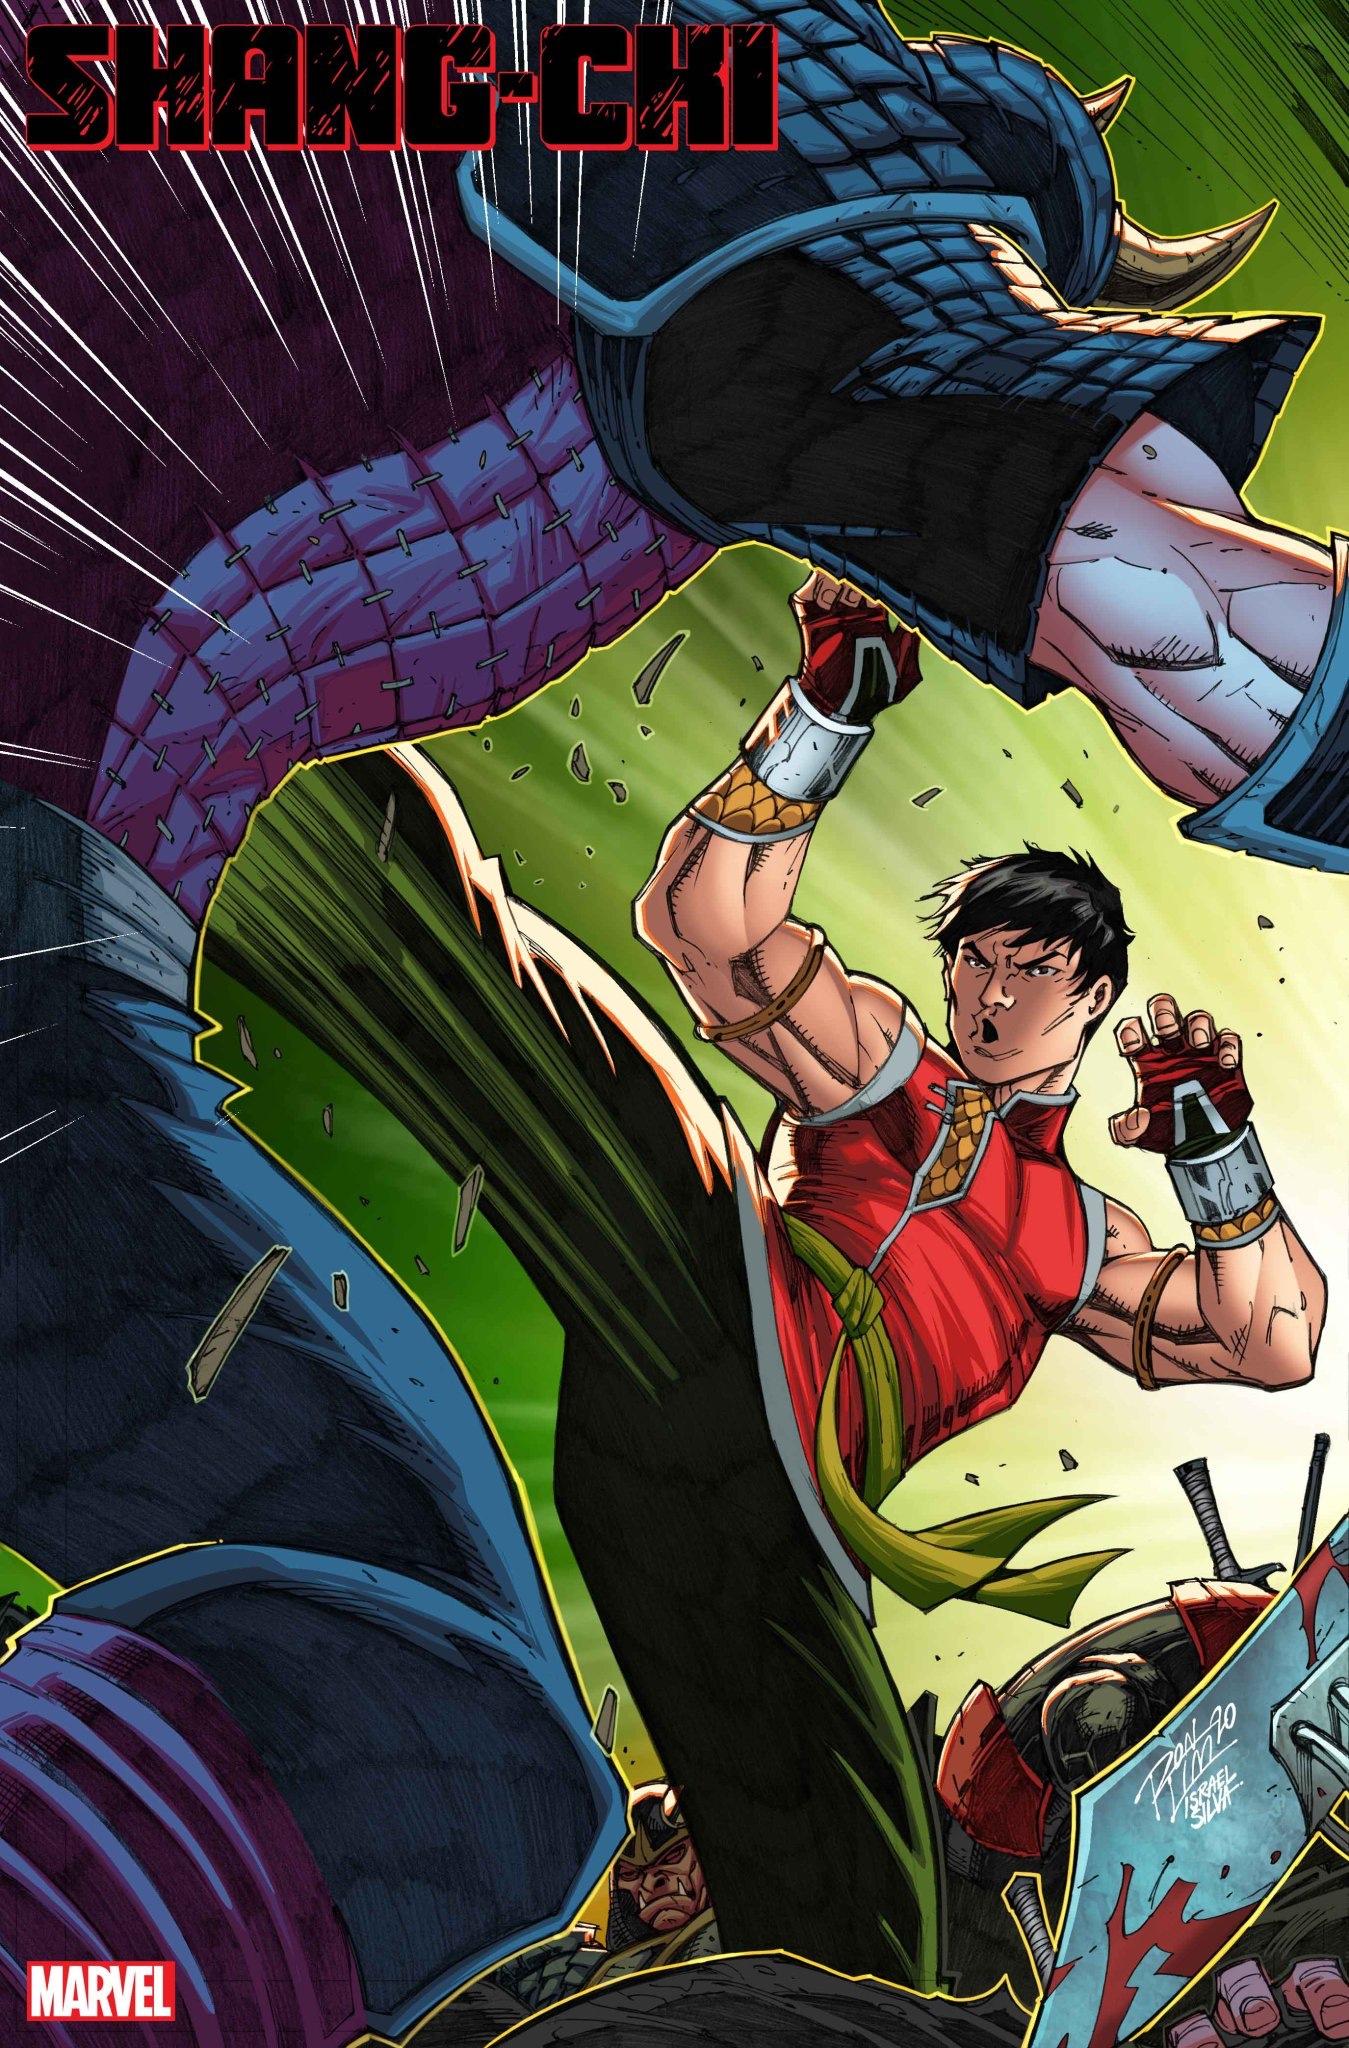 Shang-Chi #1 Ron Lim Variant Cover